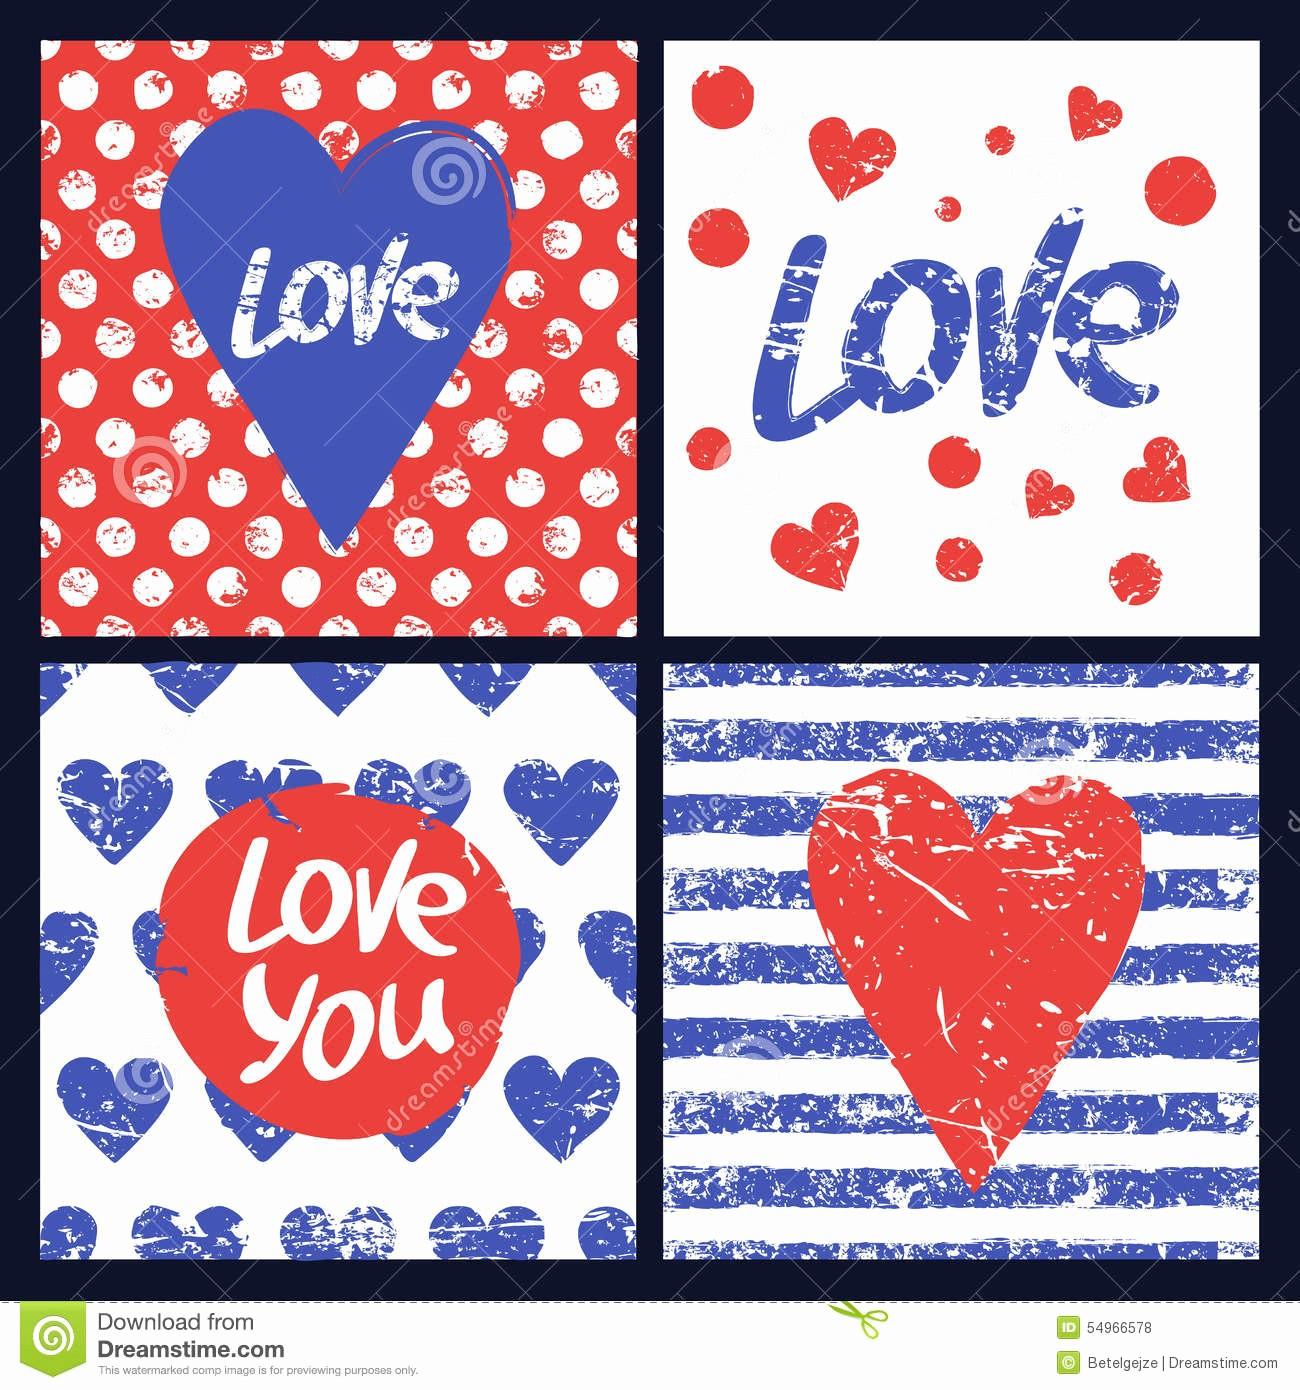 Polka Dot Template for Word Fresh Set Vector Card Template Heart Hand Drawn Word Love